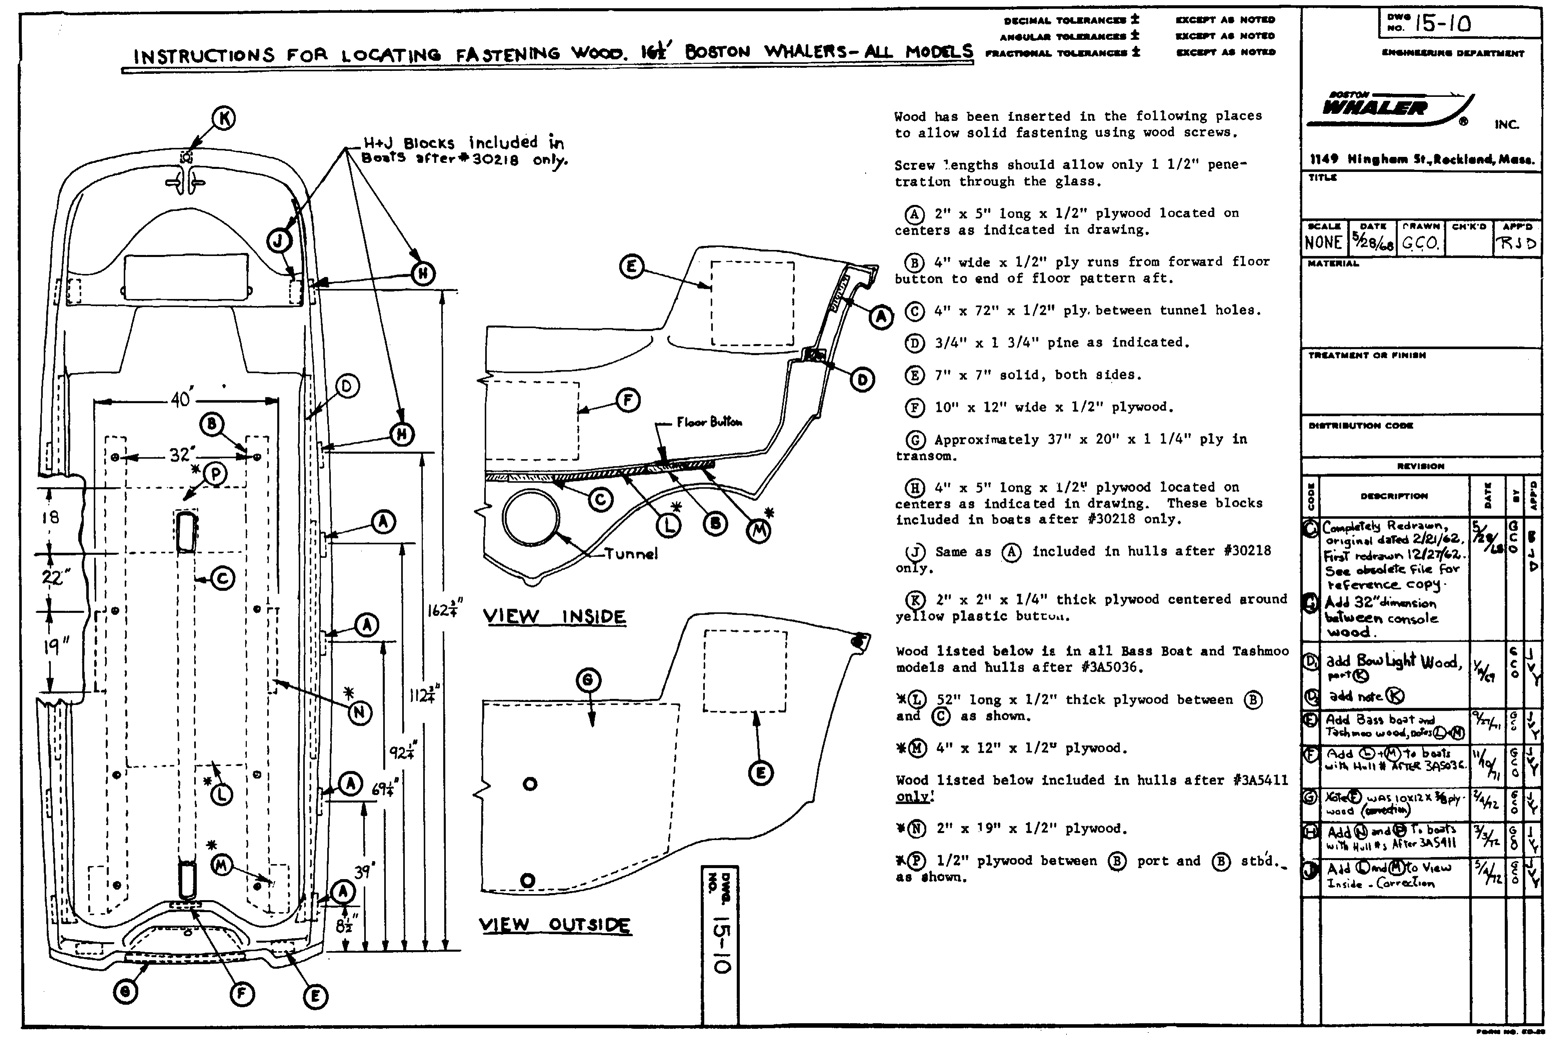 16WoodDWG15 10?resize=665%2C444 harrington hoist wiring diagram wiring diagram harrington hoist wiring diagram at nearapp.co